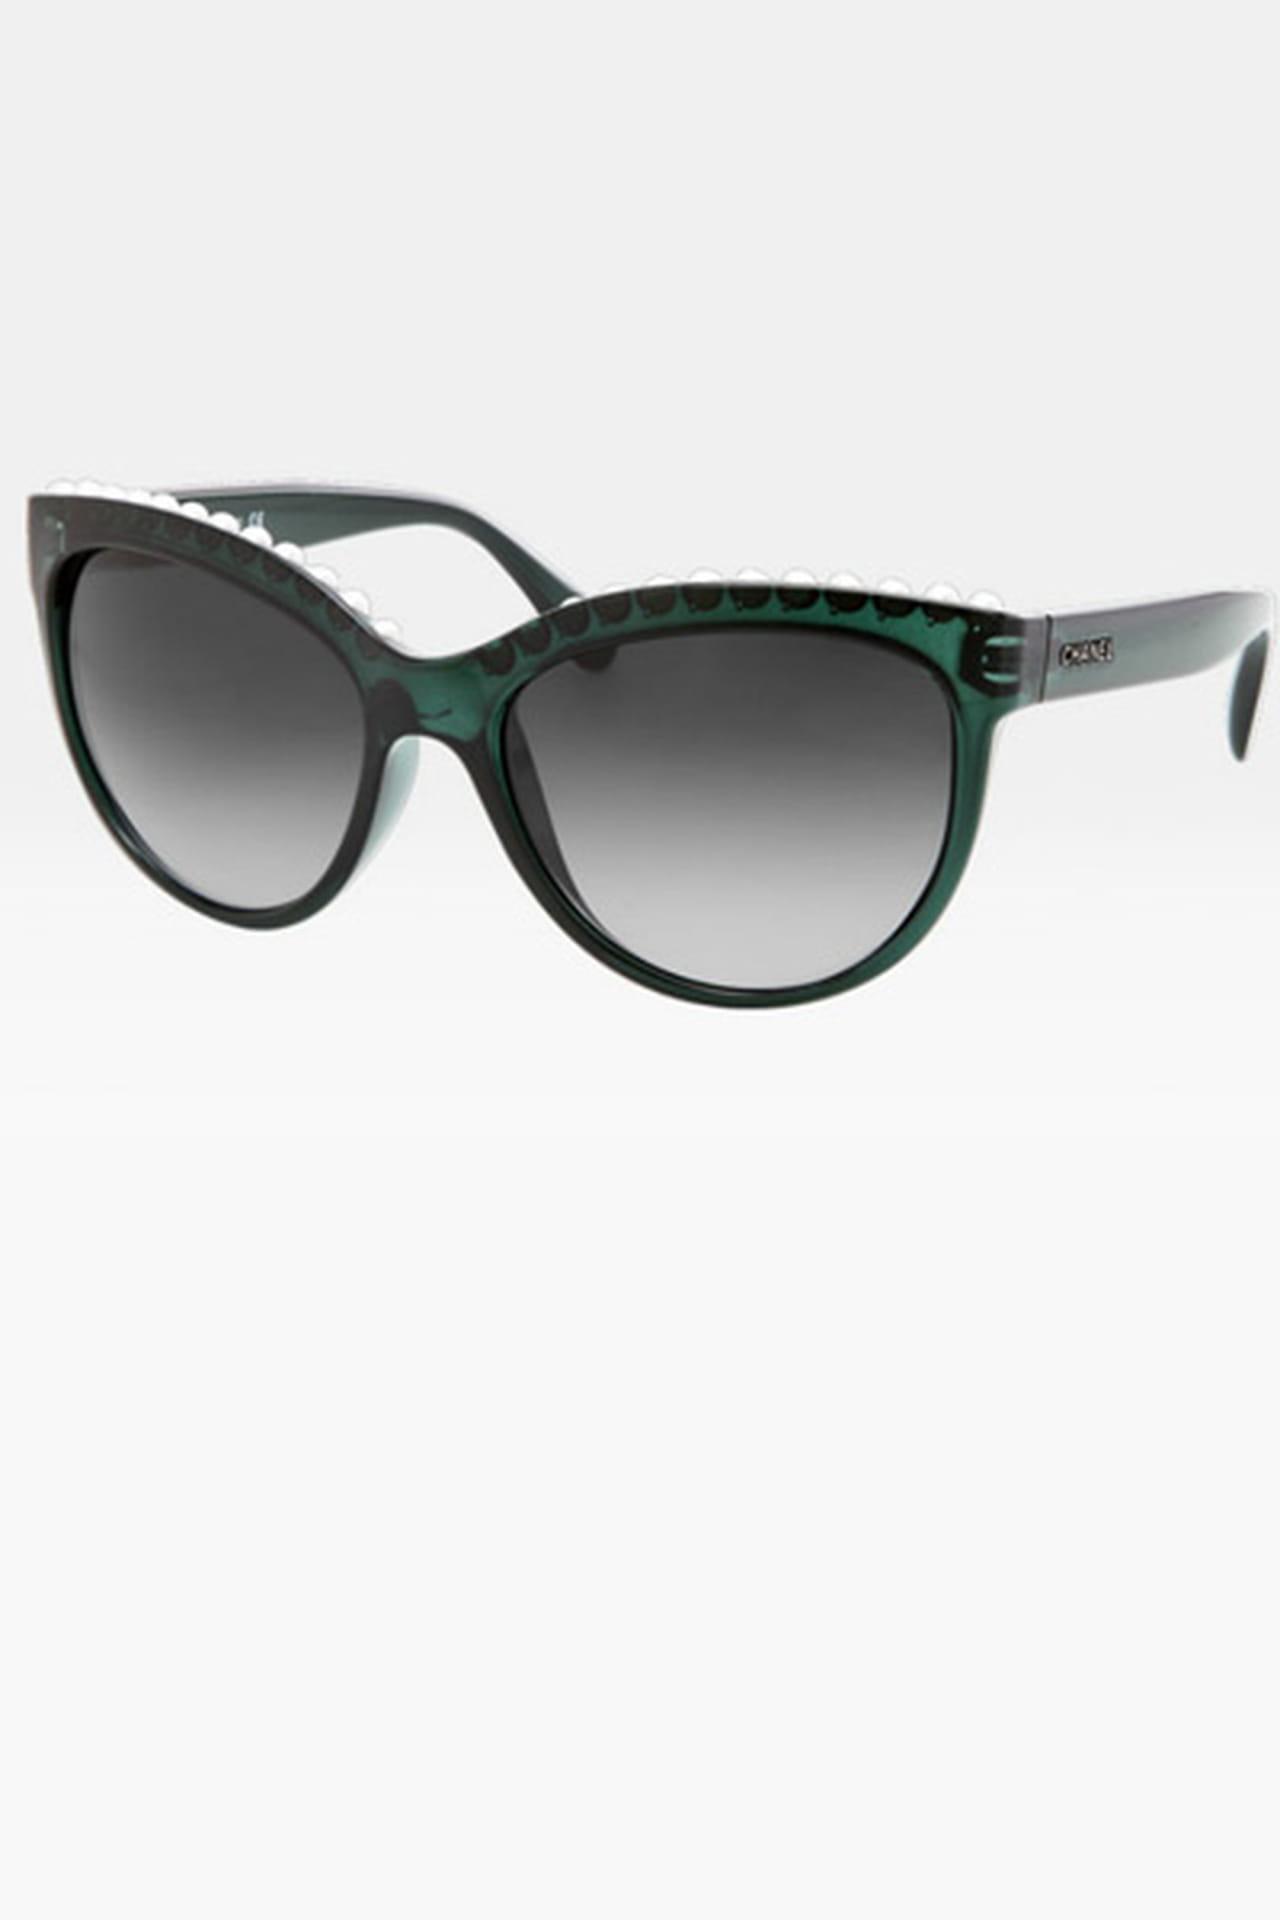 61c29e1d4 نظارة شمسية مزينة باللؤلؤ من Chanel. من مجموعة Chanel لربيع وصيف 2013